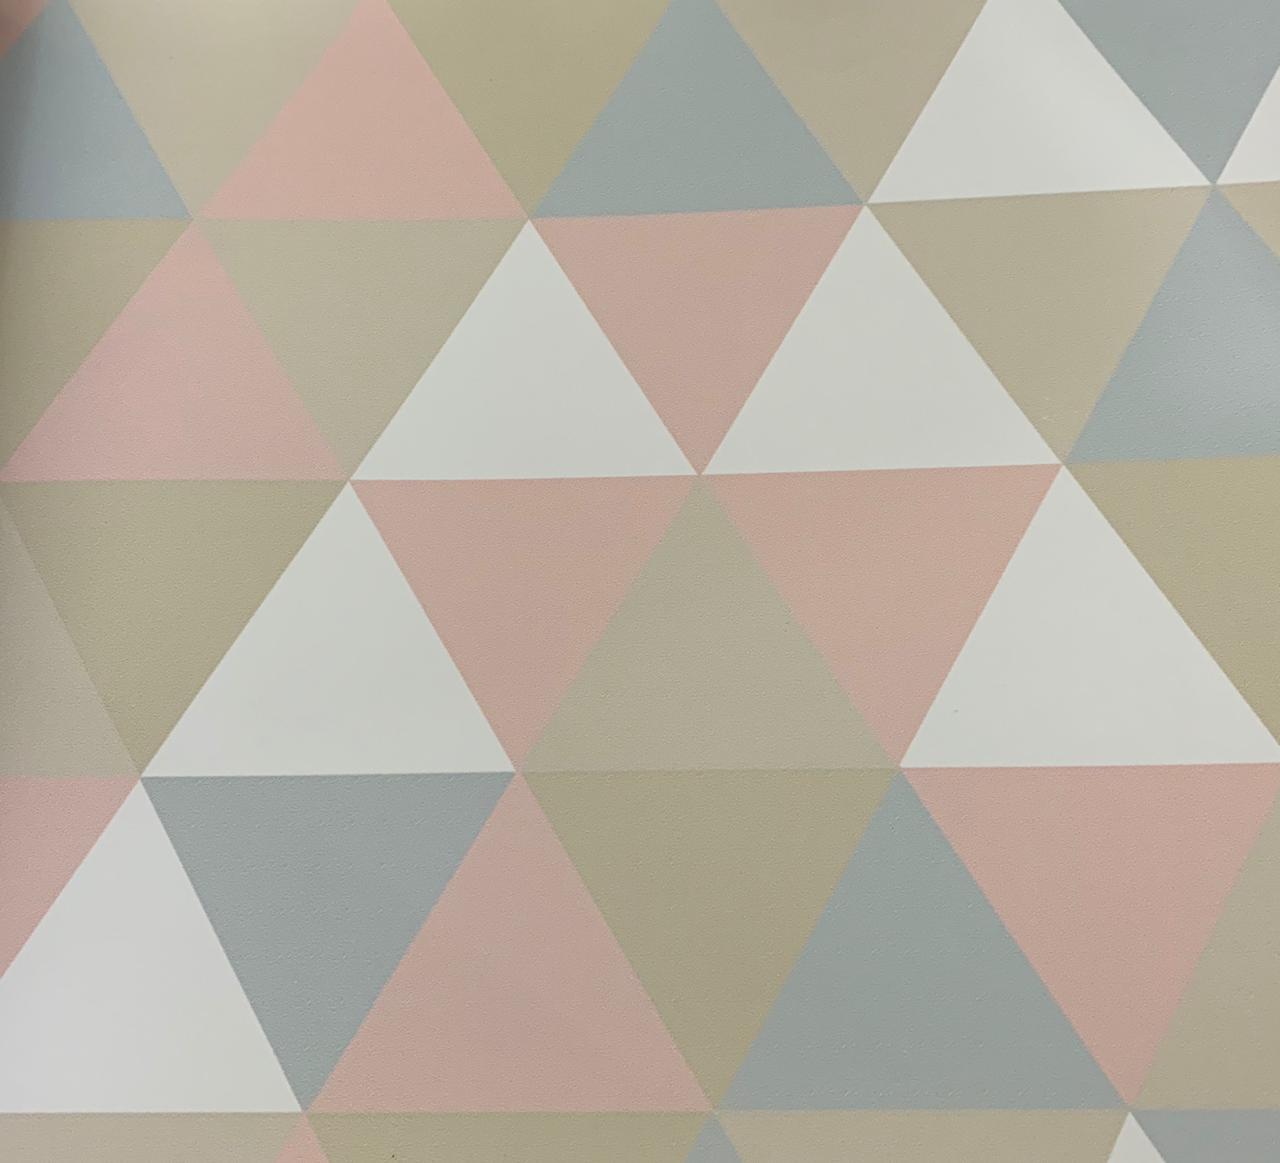 Papel de Parede Triângulo Branco,Rosa,Azul e Bege